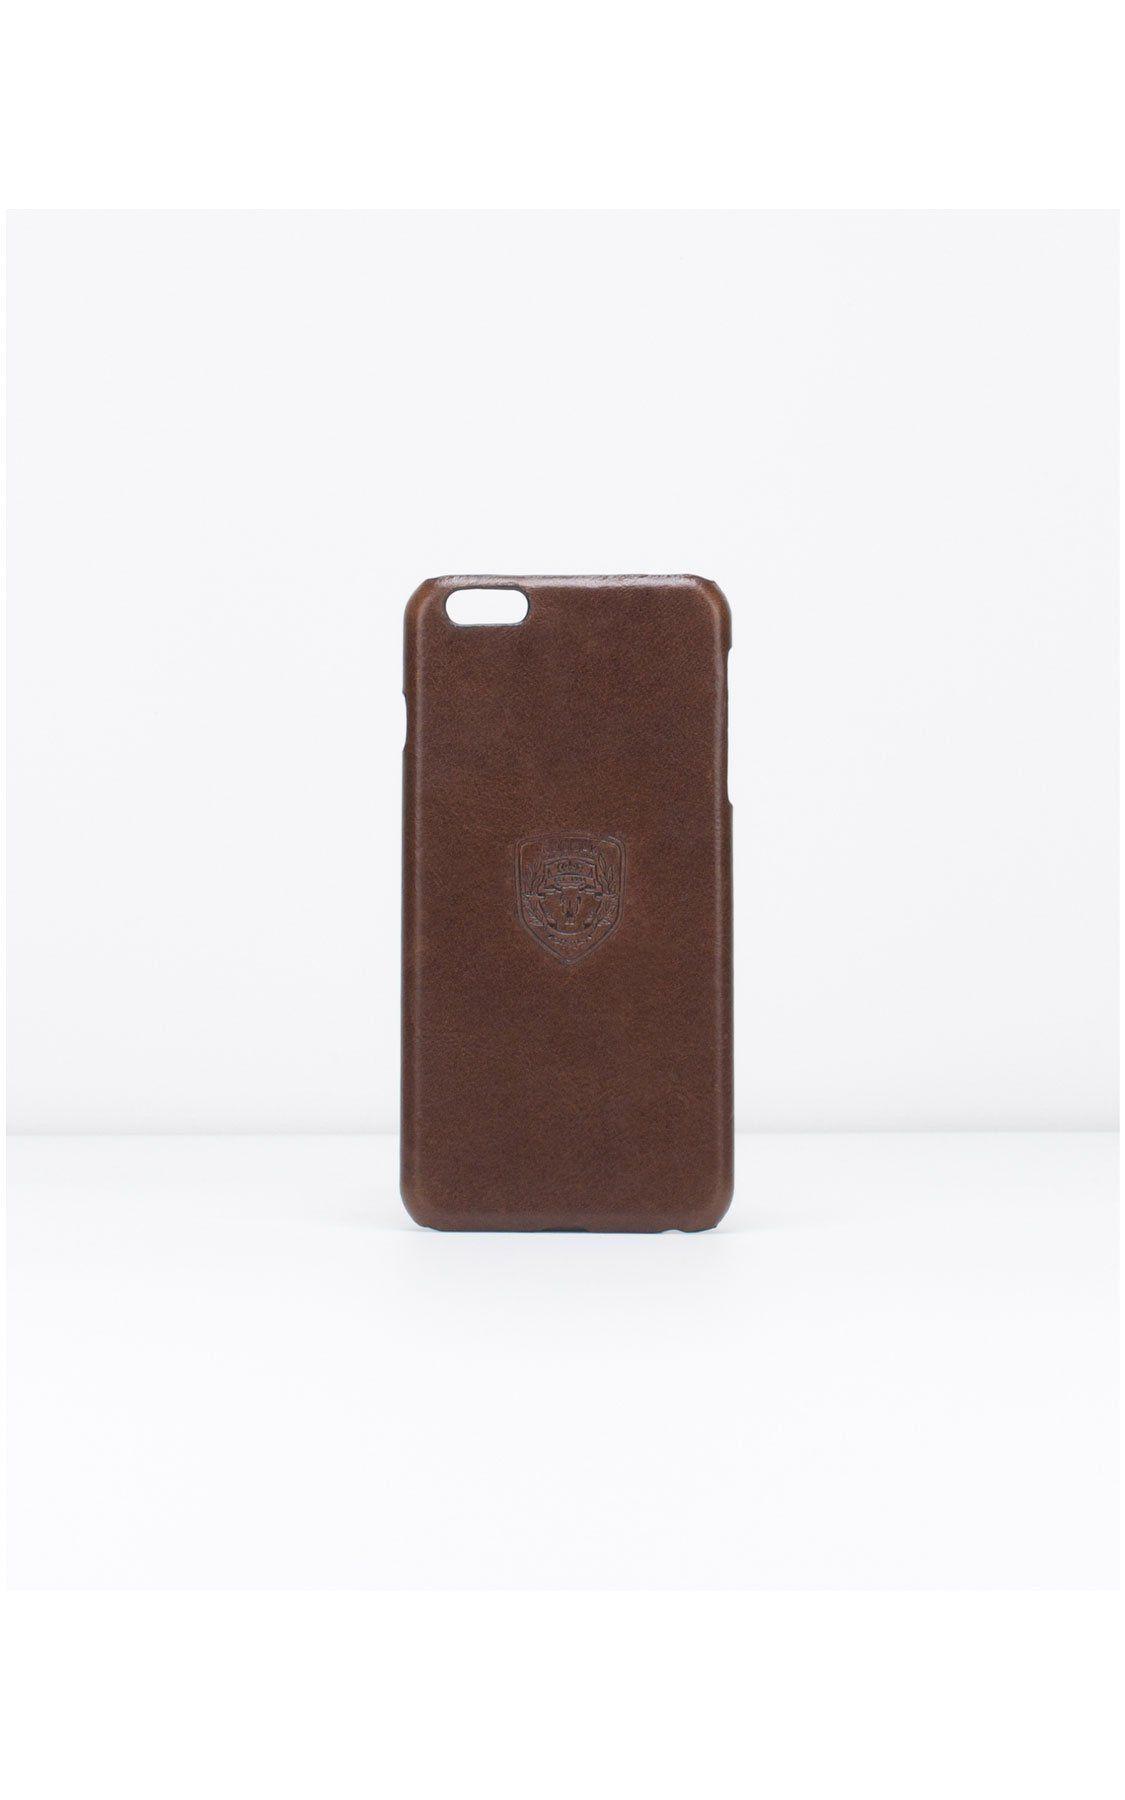 2234d1422a Rudsak Phone Case Fredericton 8415906